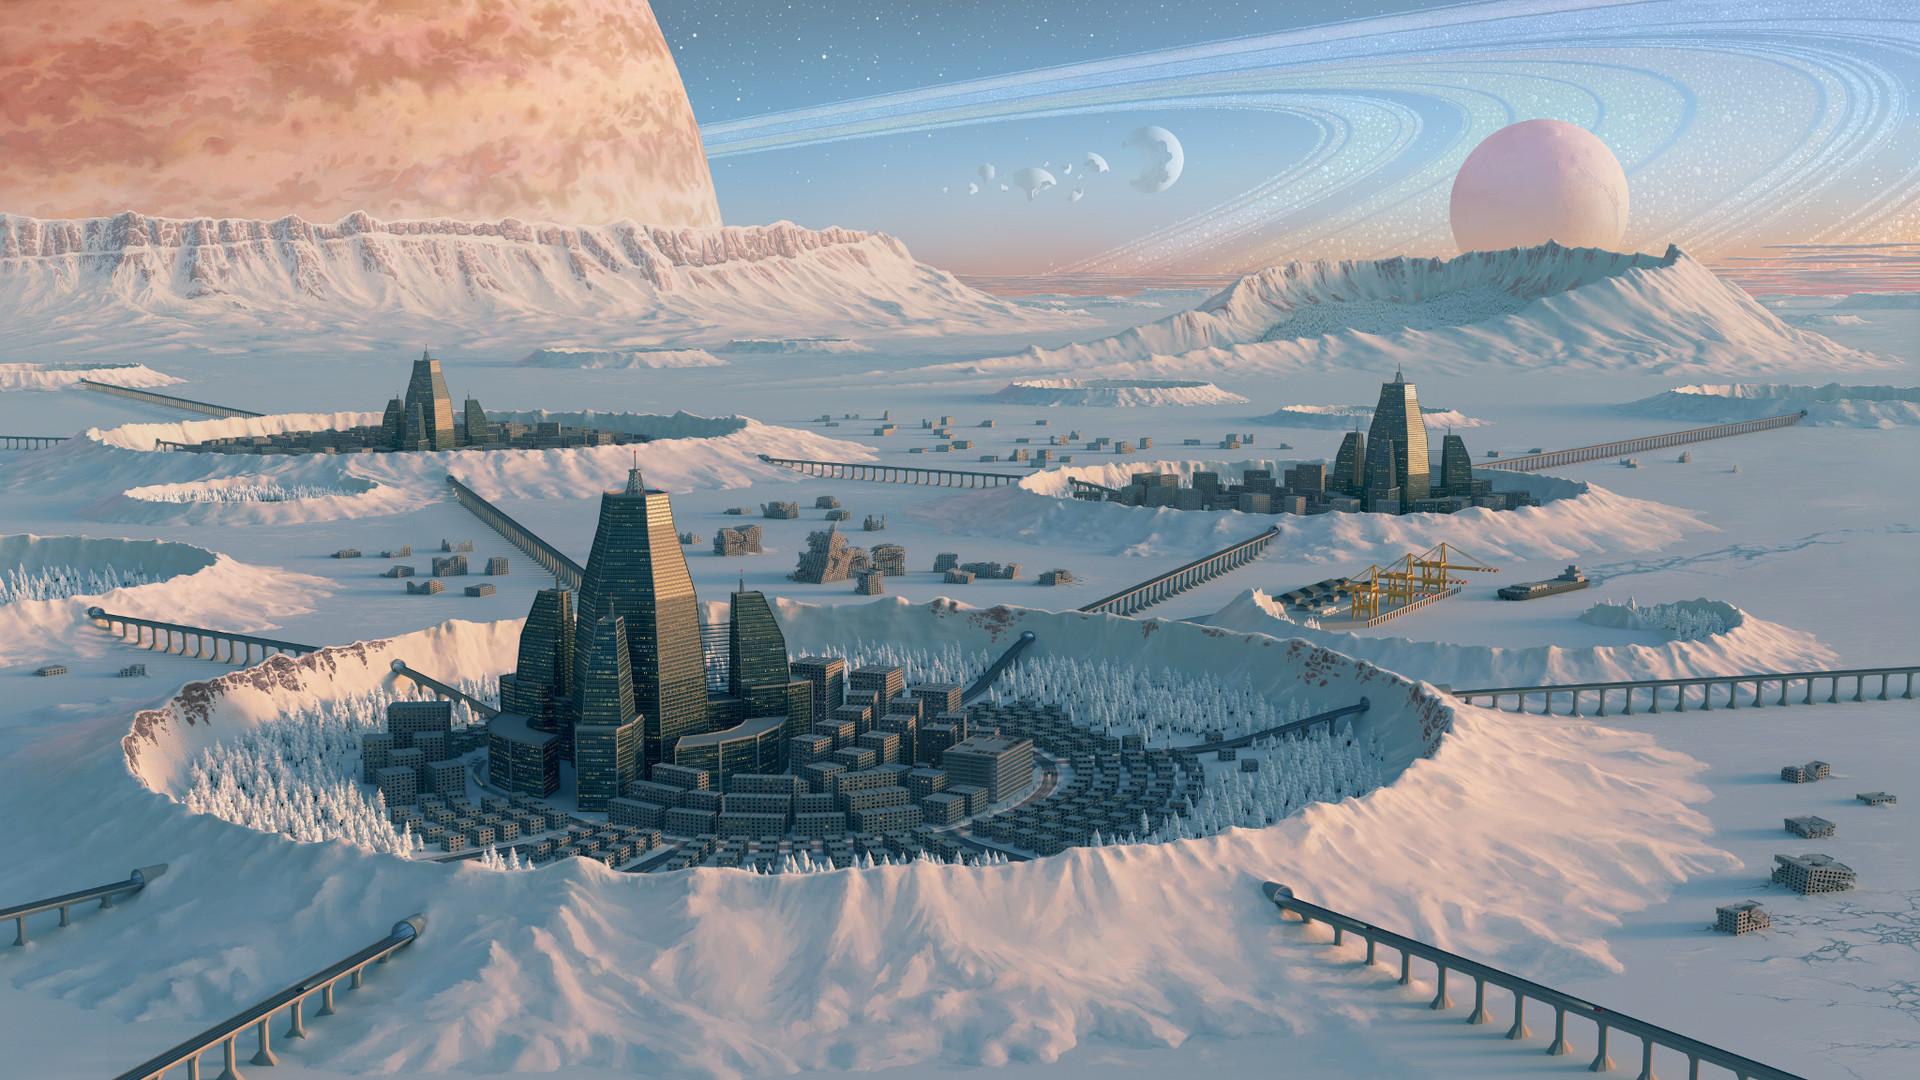 jonatan-cwiakalski-stolen-earth.jpg?1509